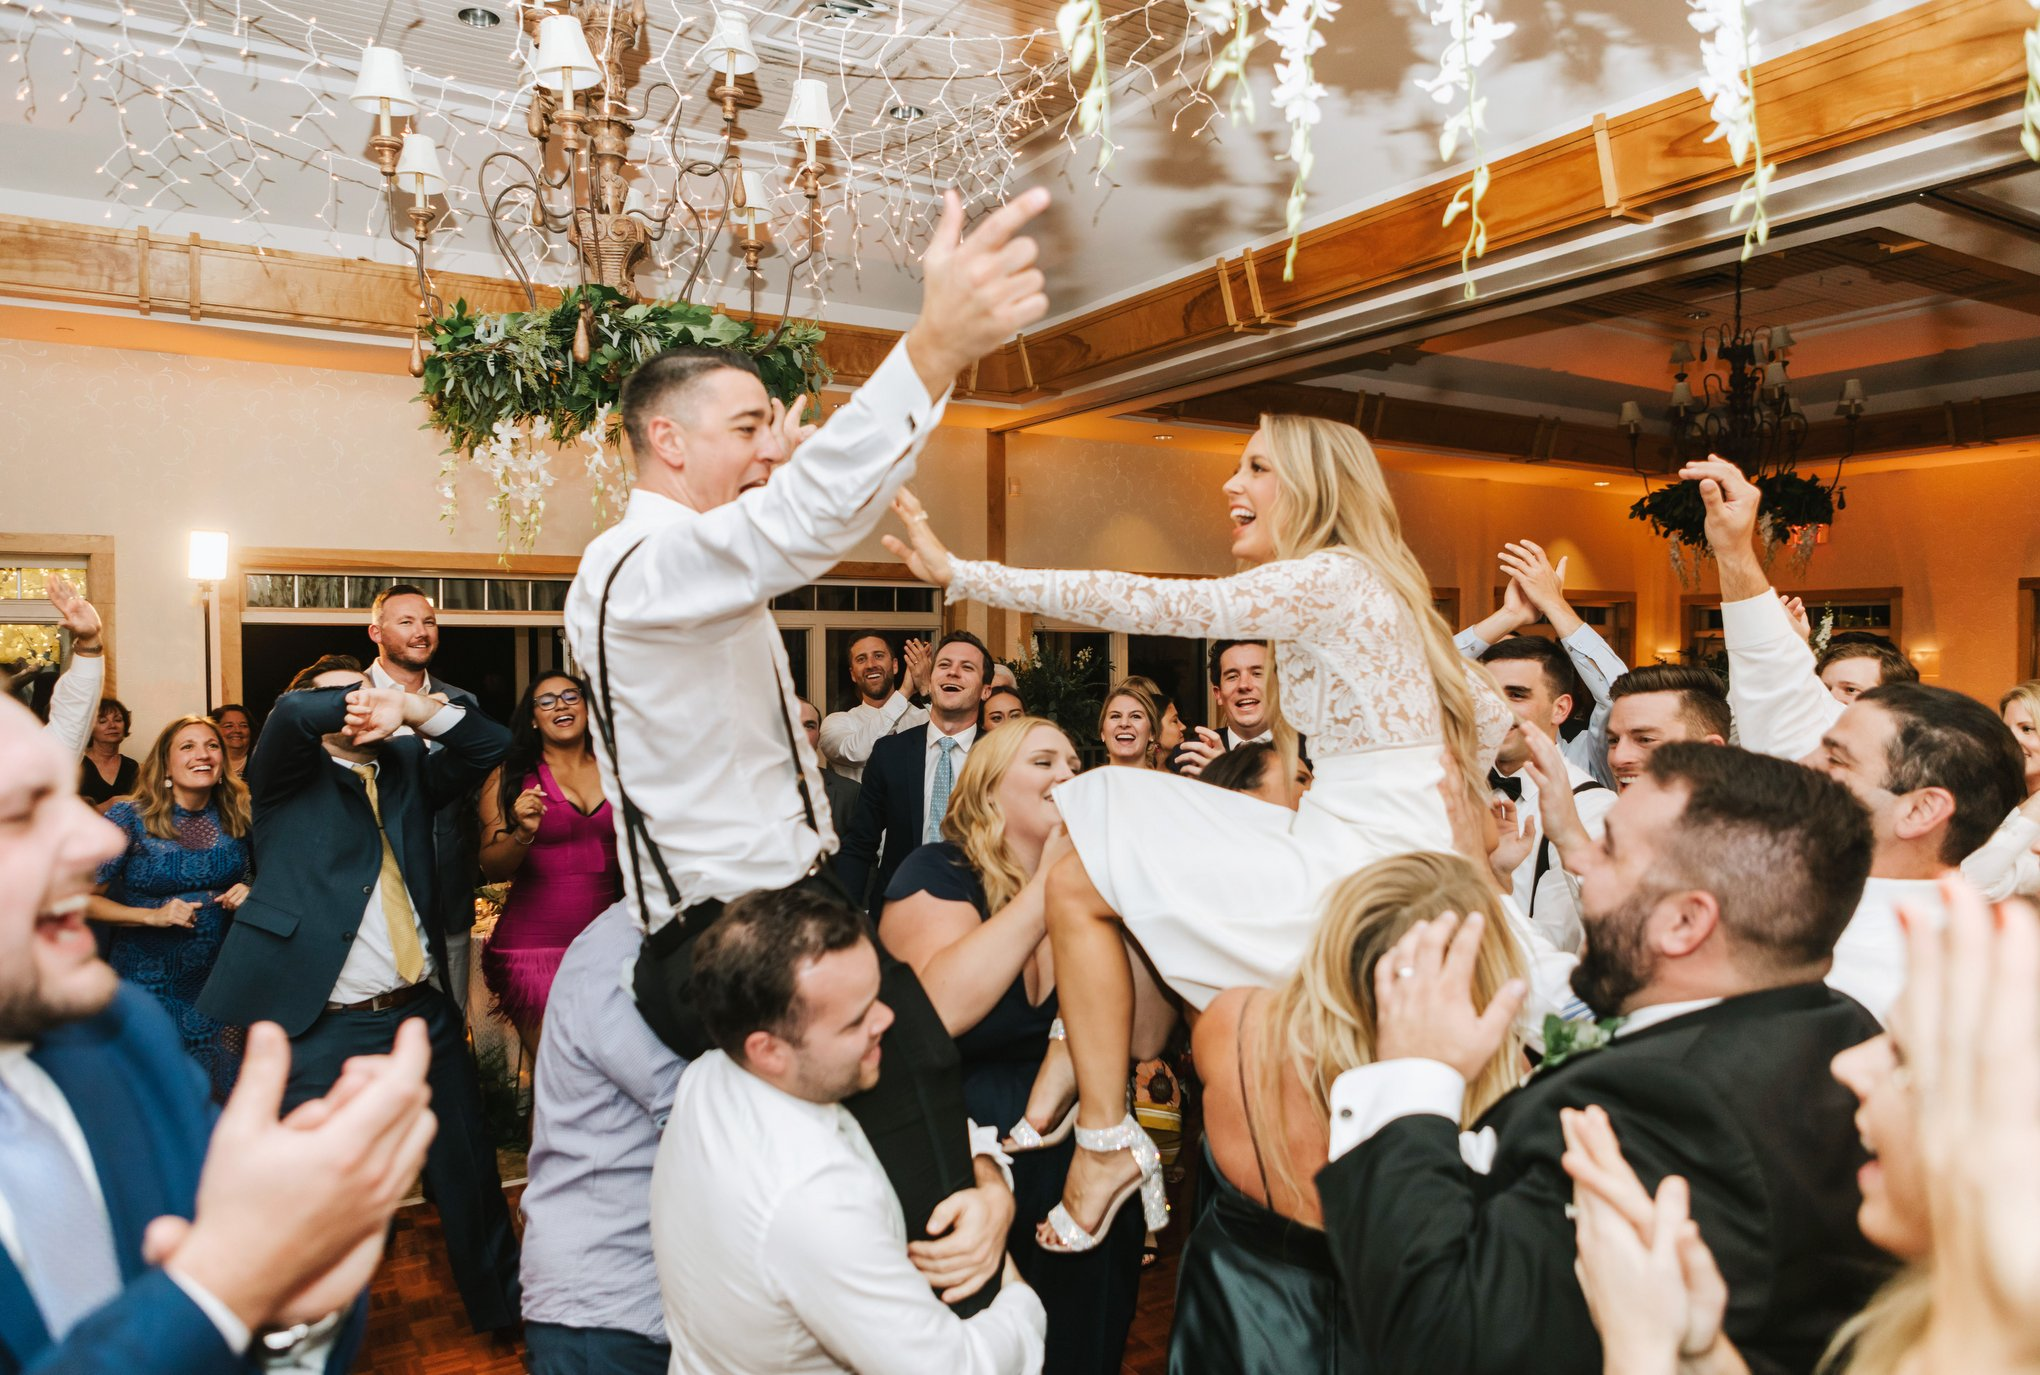 Wequassett-Wedding-Photographer-Cape-Cod-Boston-Lena-Mirisola-51.jpg